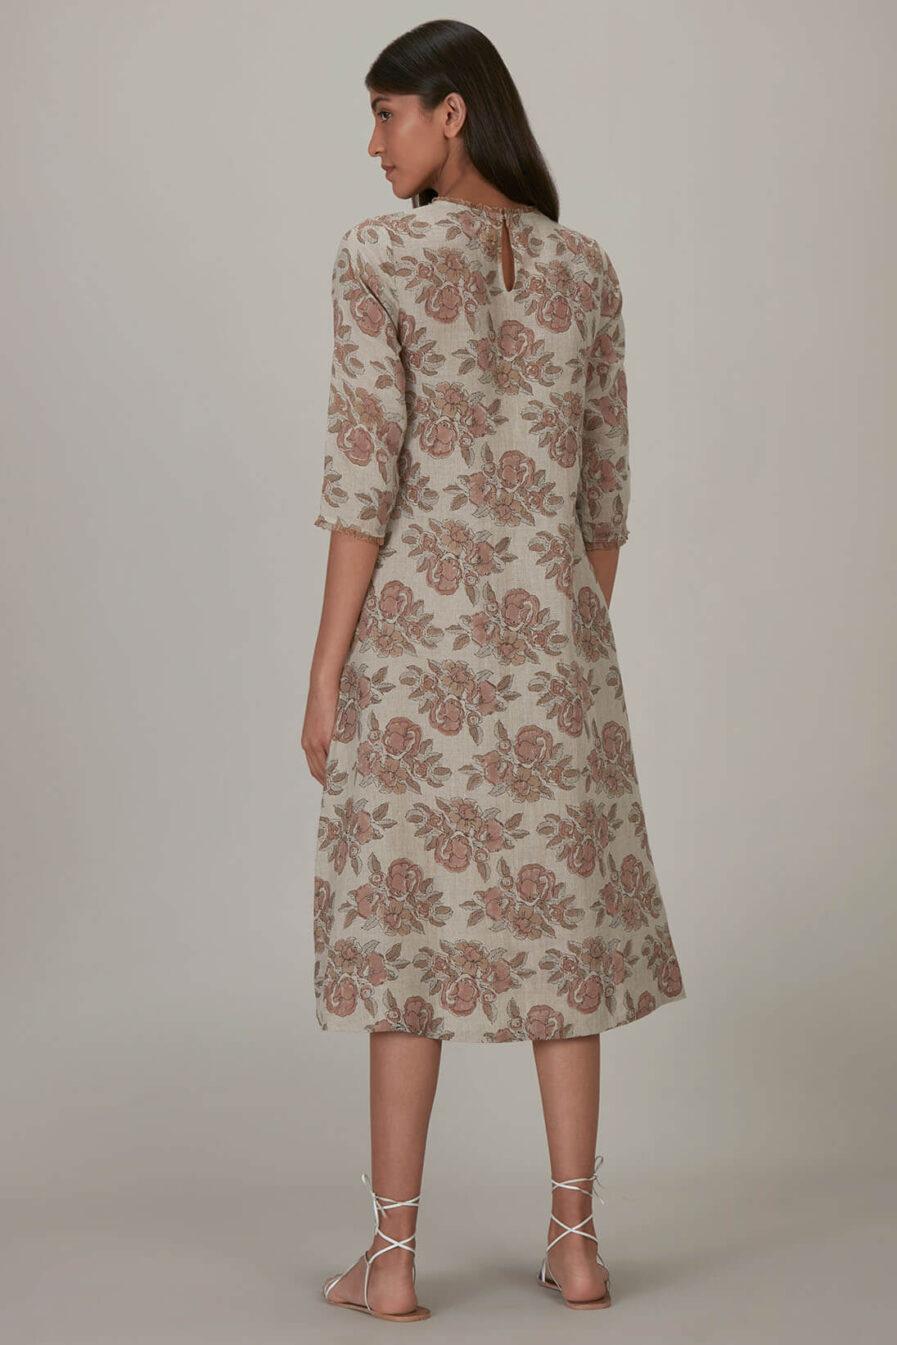 Anavila Peach Block Printed Estella Dress